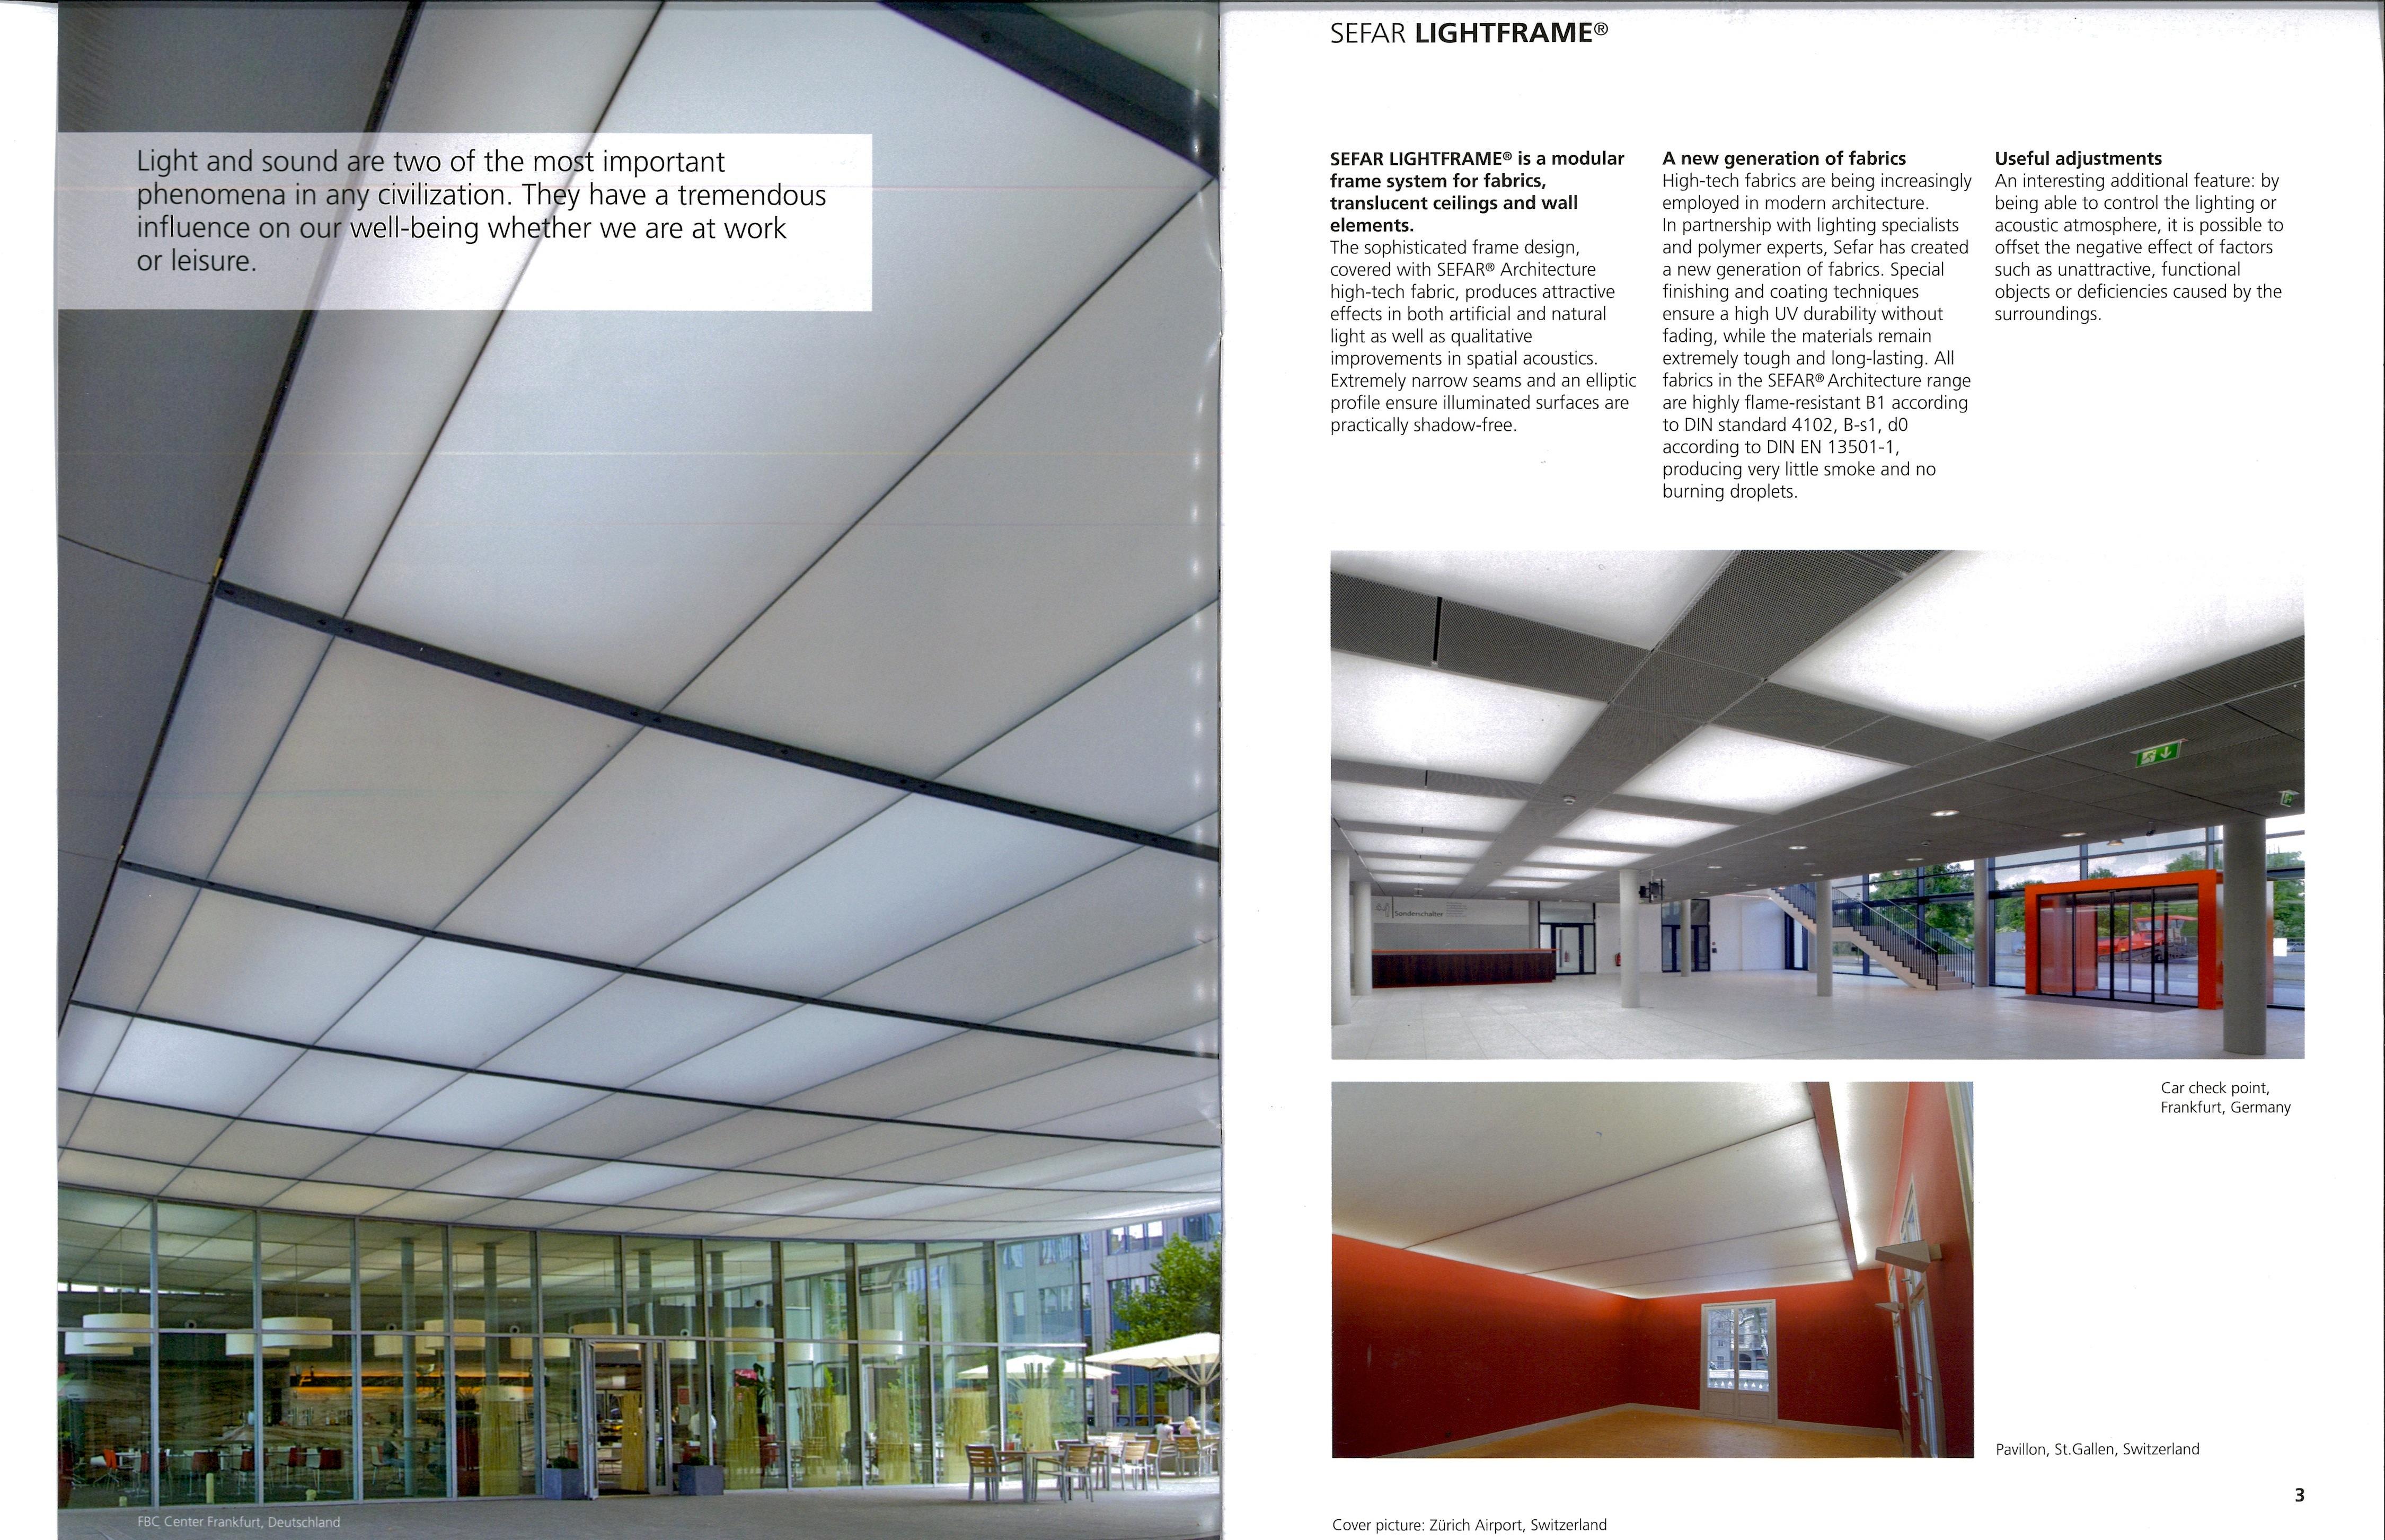 New SEFAR LightFrame® Brochure Spotlights Light Diffusion and